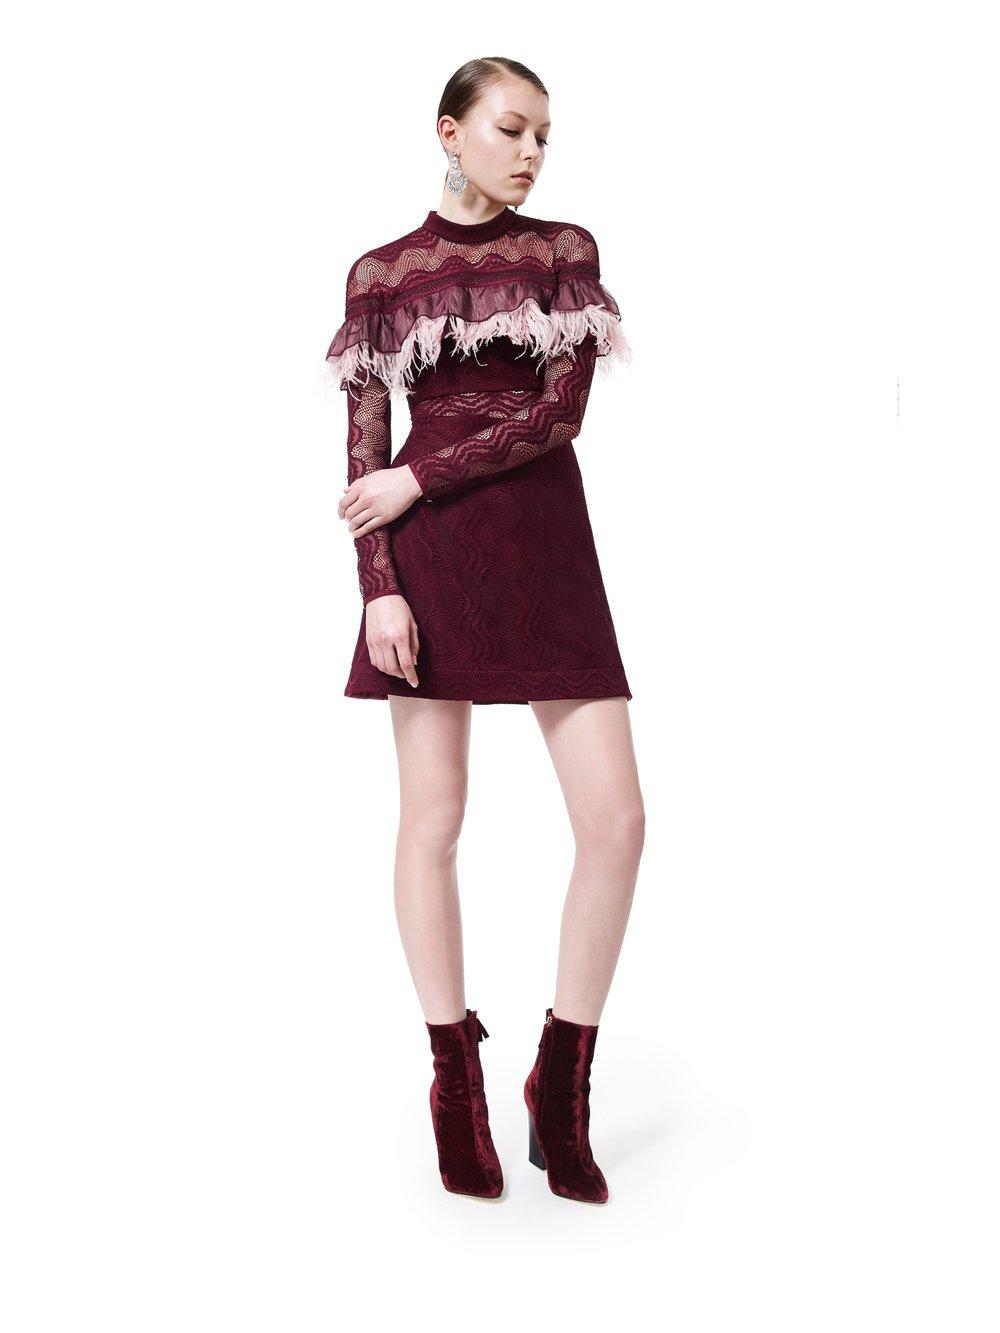 Wildfire Dress £300